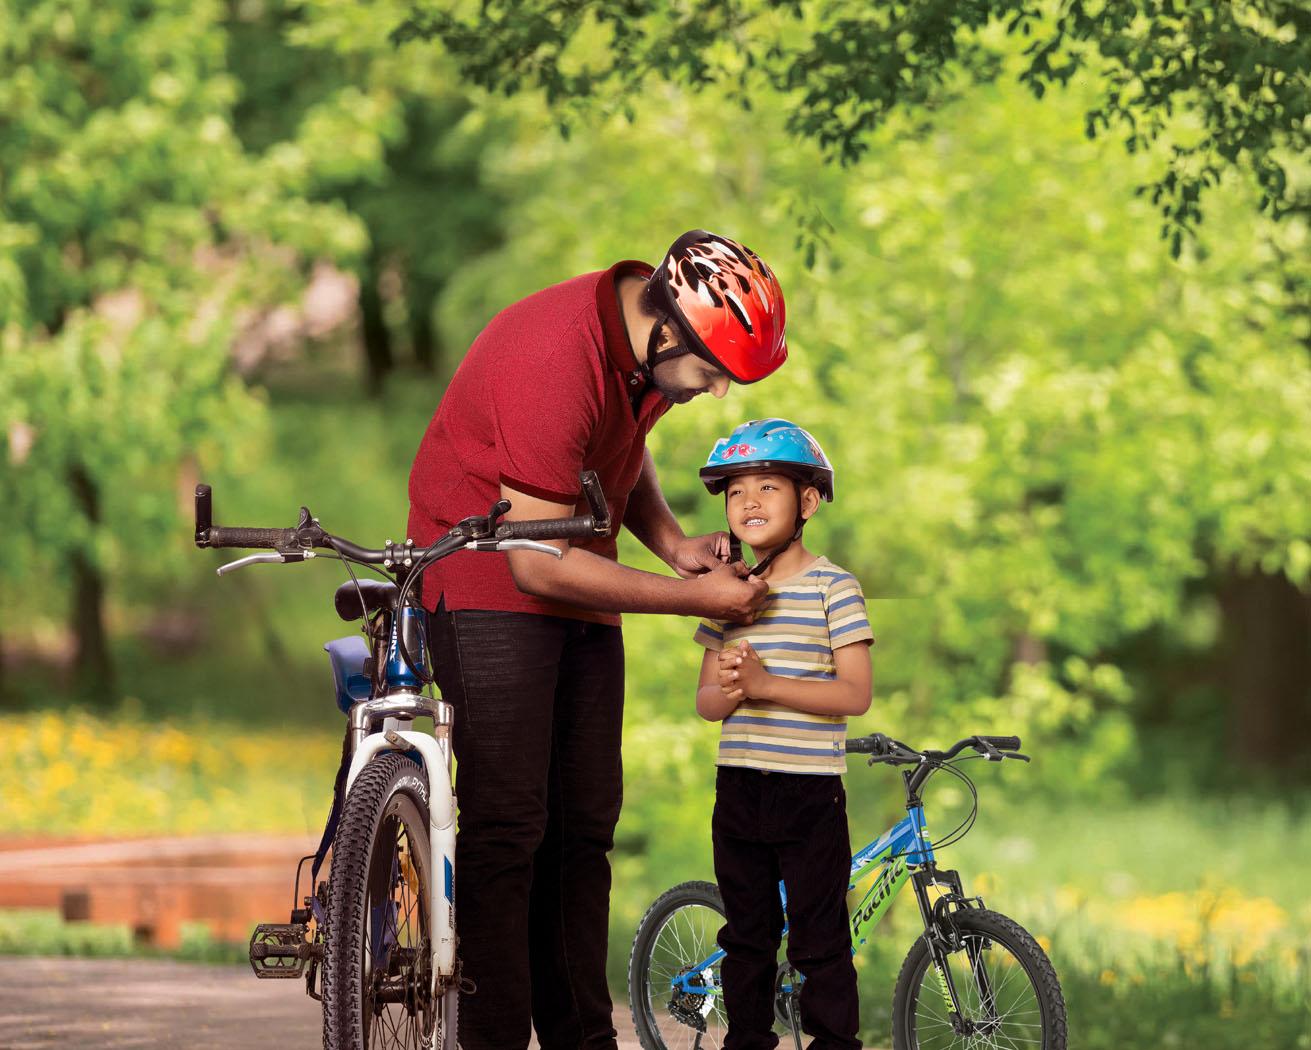 श्रीवृद्धि जीवन बीमा योजना